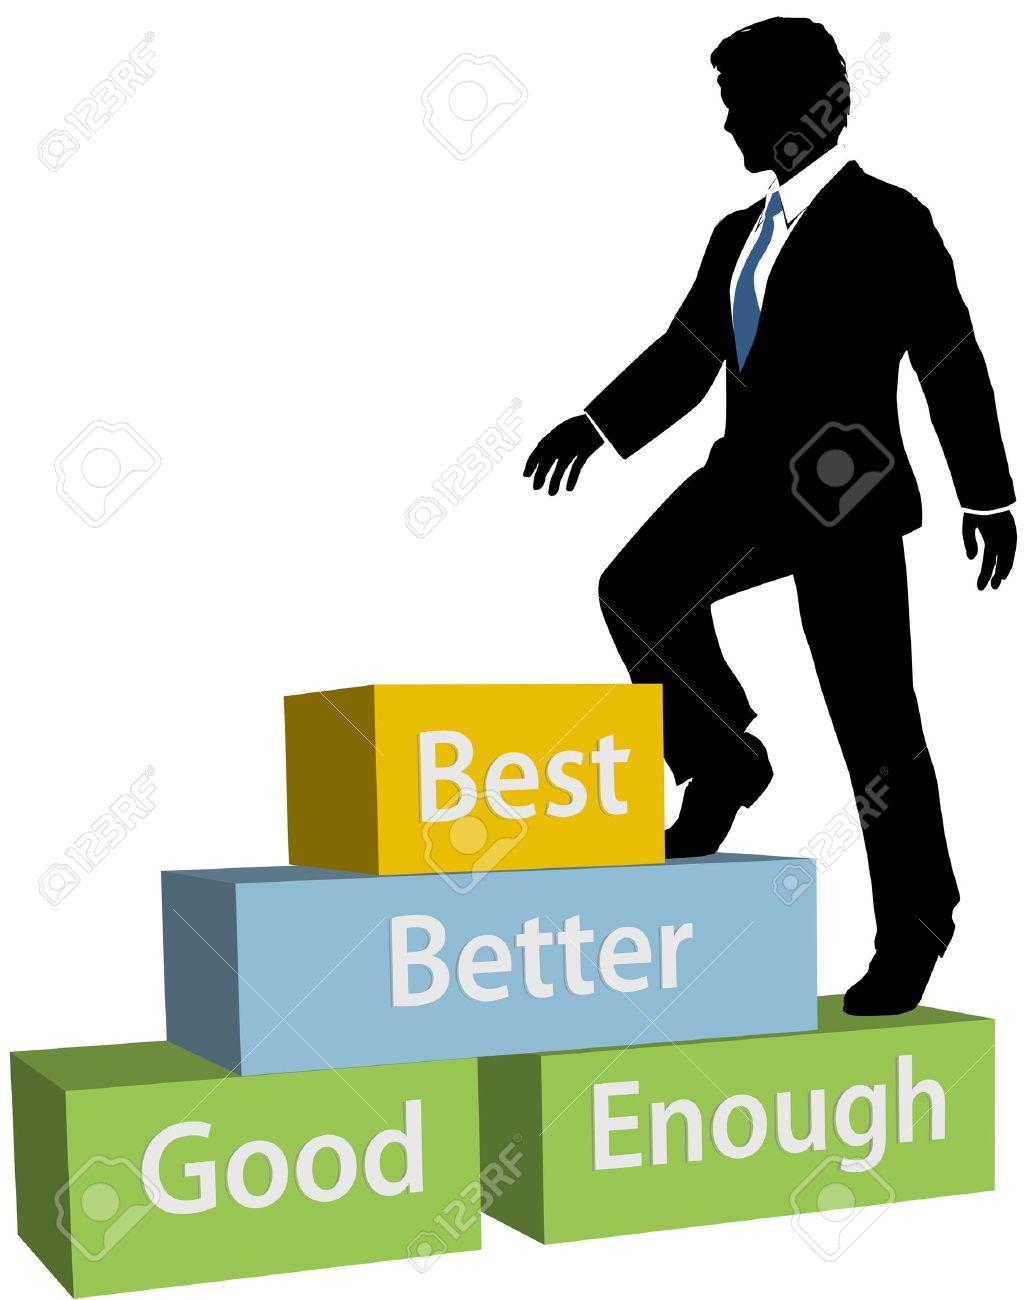 good better best examples